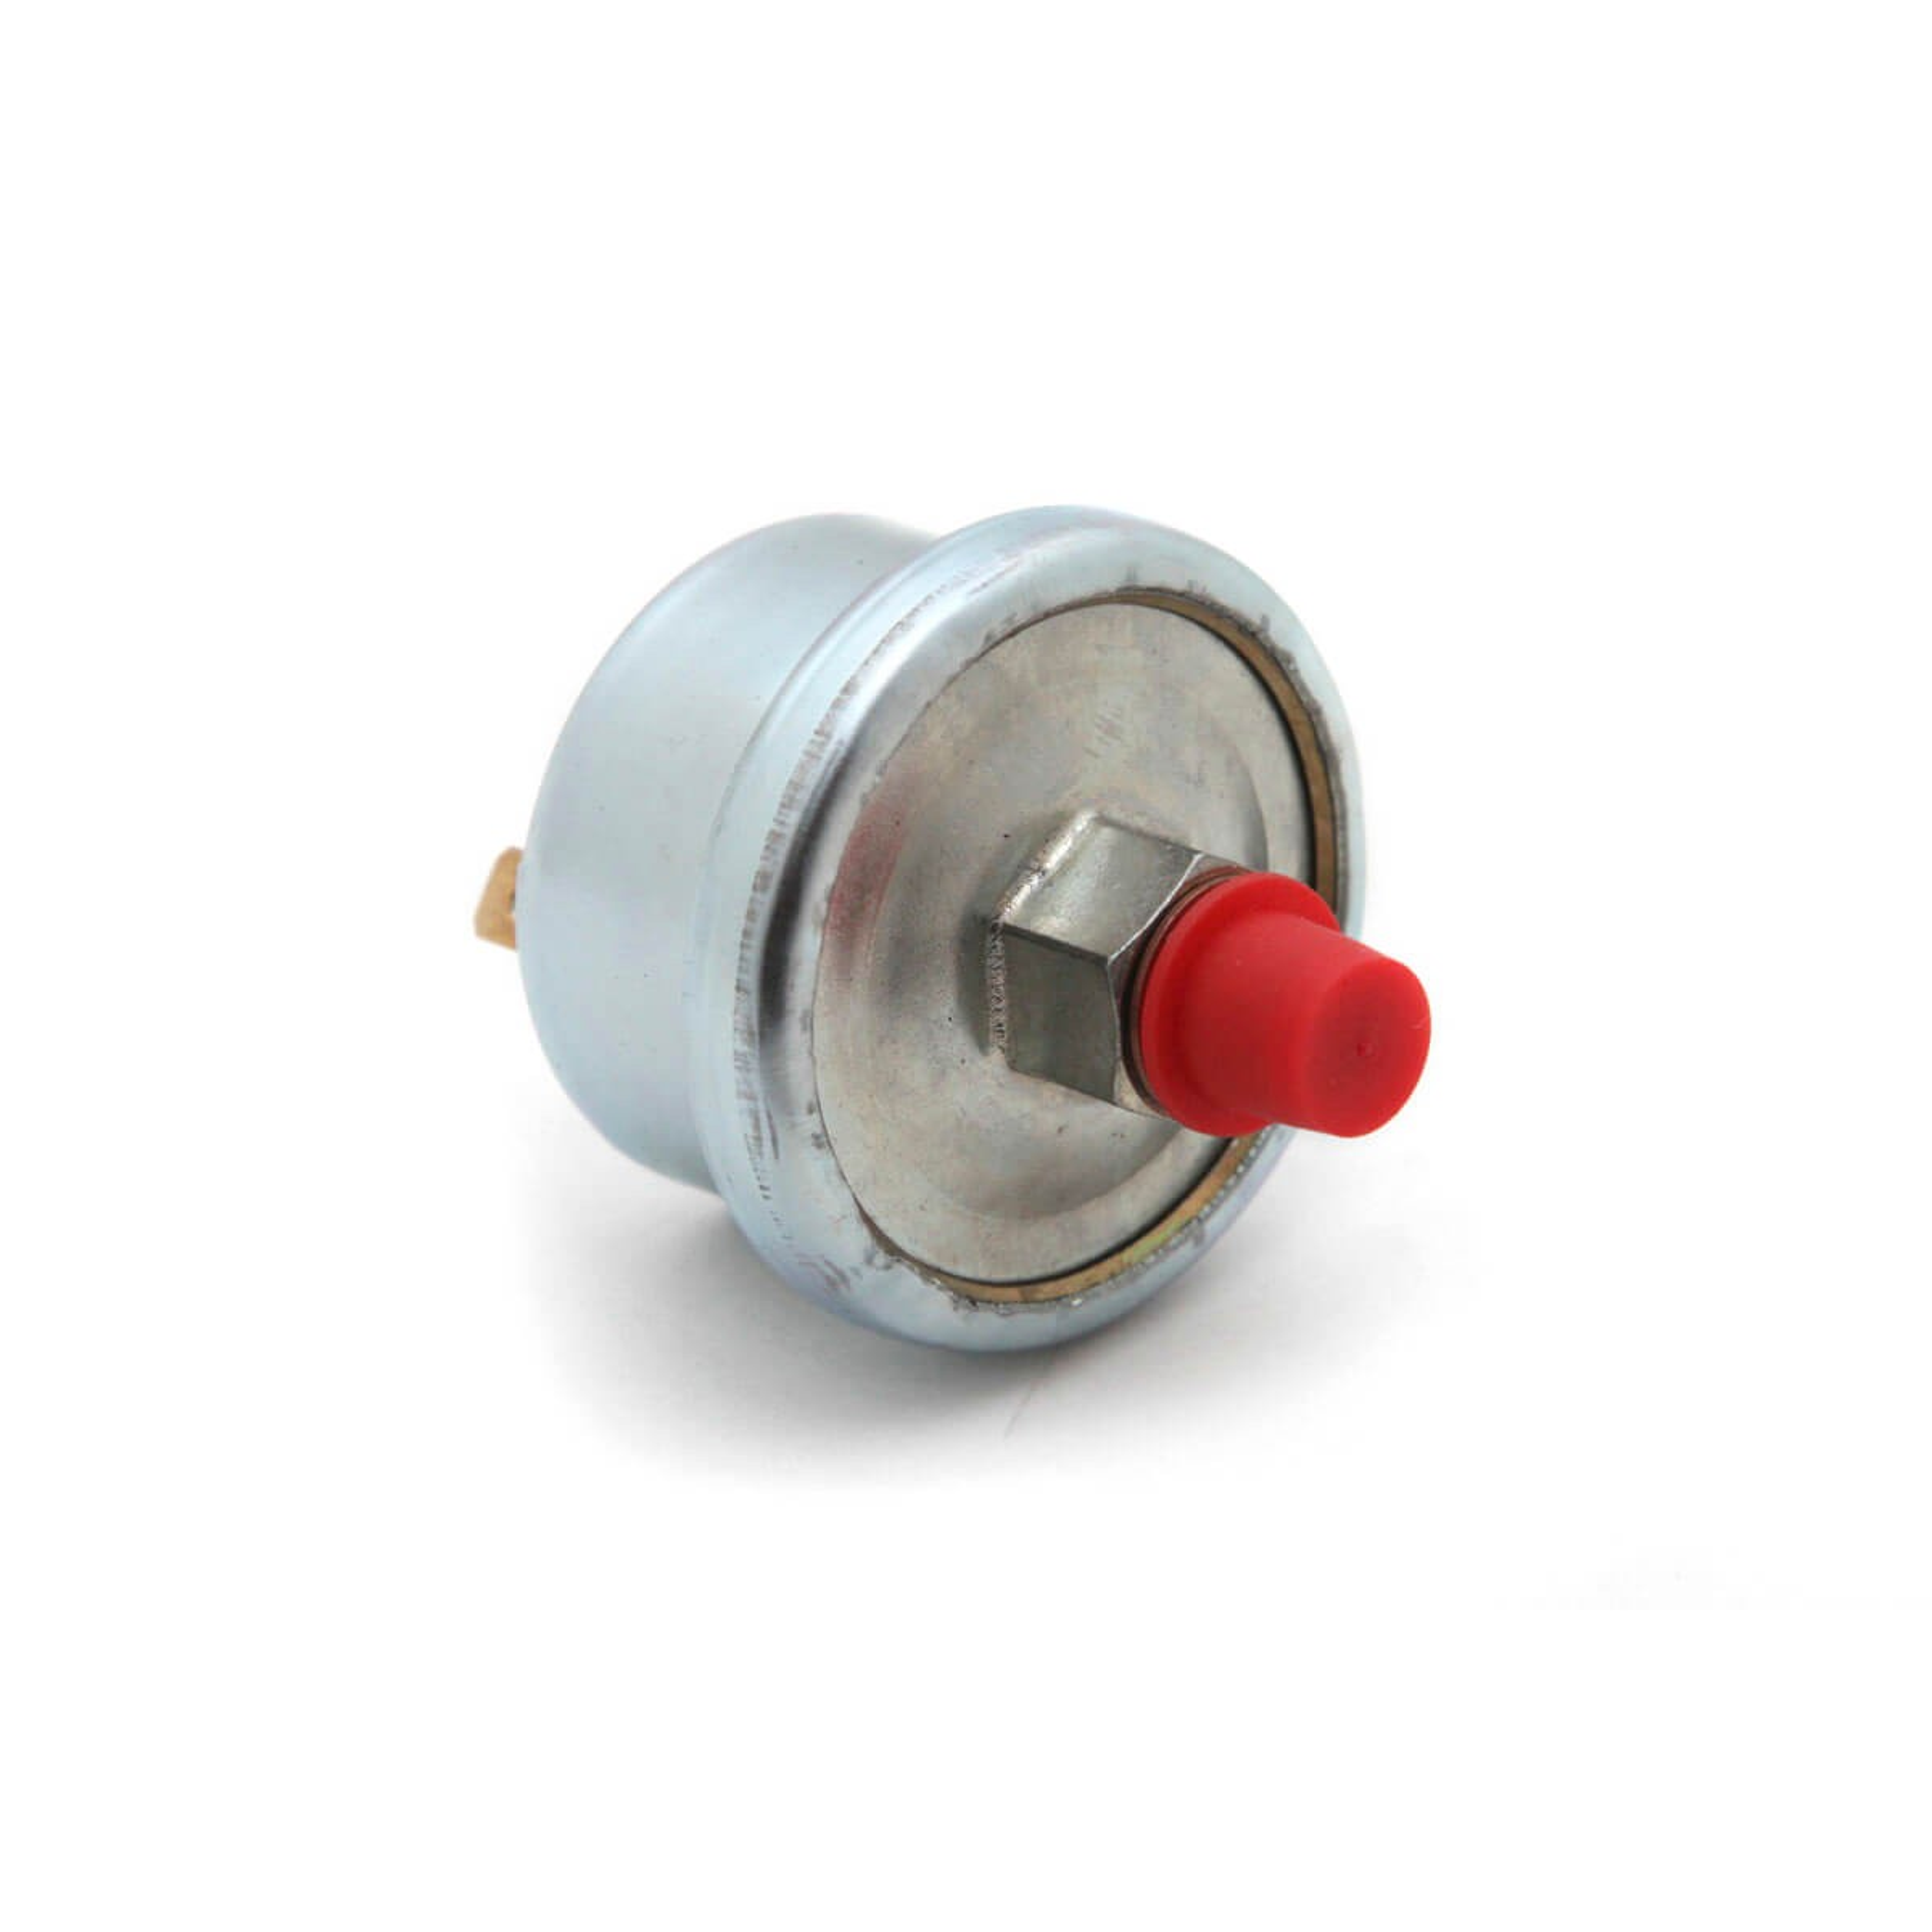 71 Tr6 Oil Pressure Sending Unit Wiring Diagram Starting Know Tr250 131 580 Moss Motors Rh Mossmotors Com